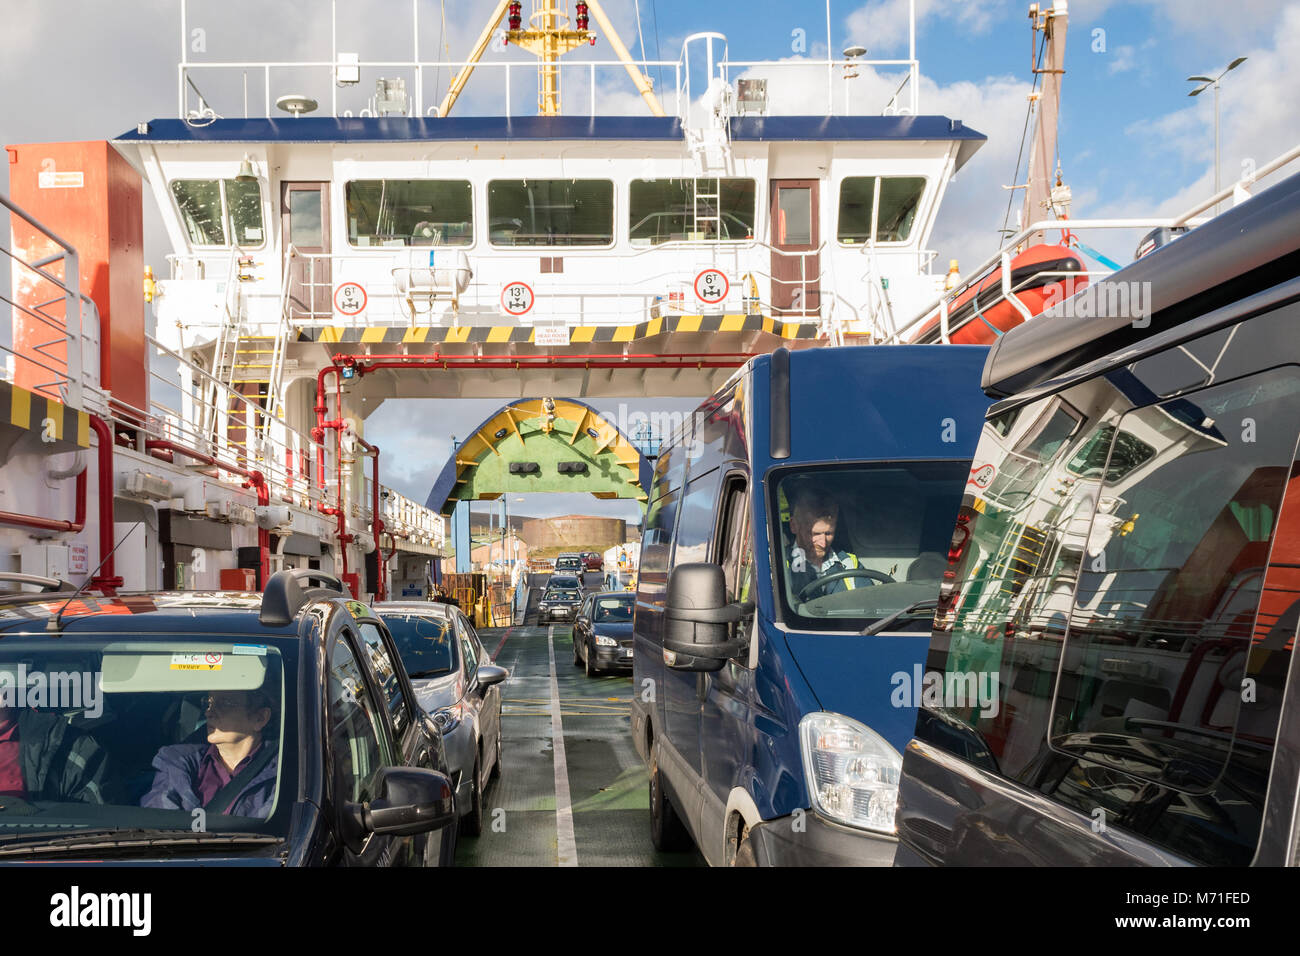 L'embarquement des véhicules sur l'Orkney Ferries ferry de The Tudor Orkney Ferry Terminal, Hoy, Orkney Photo Stock